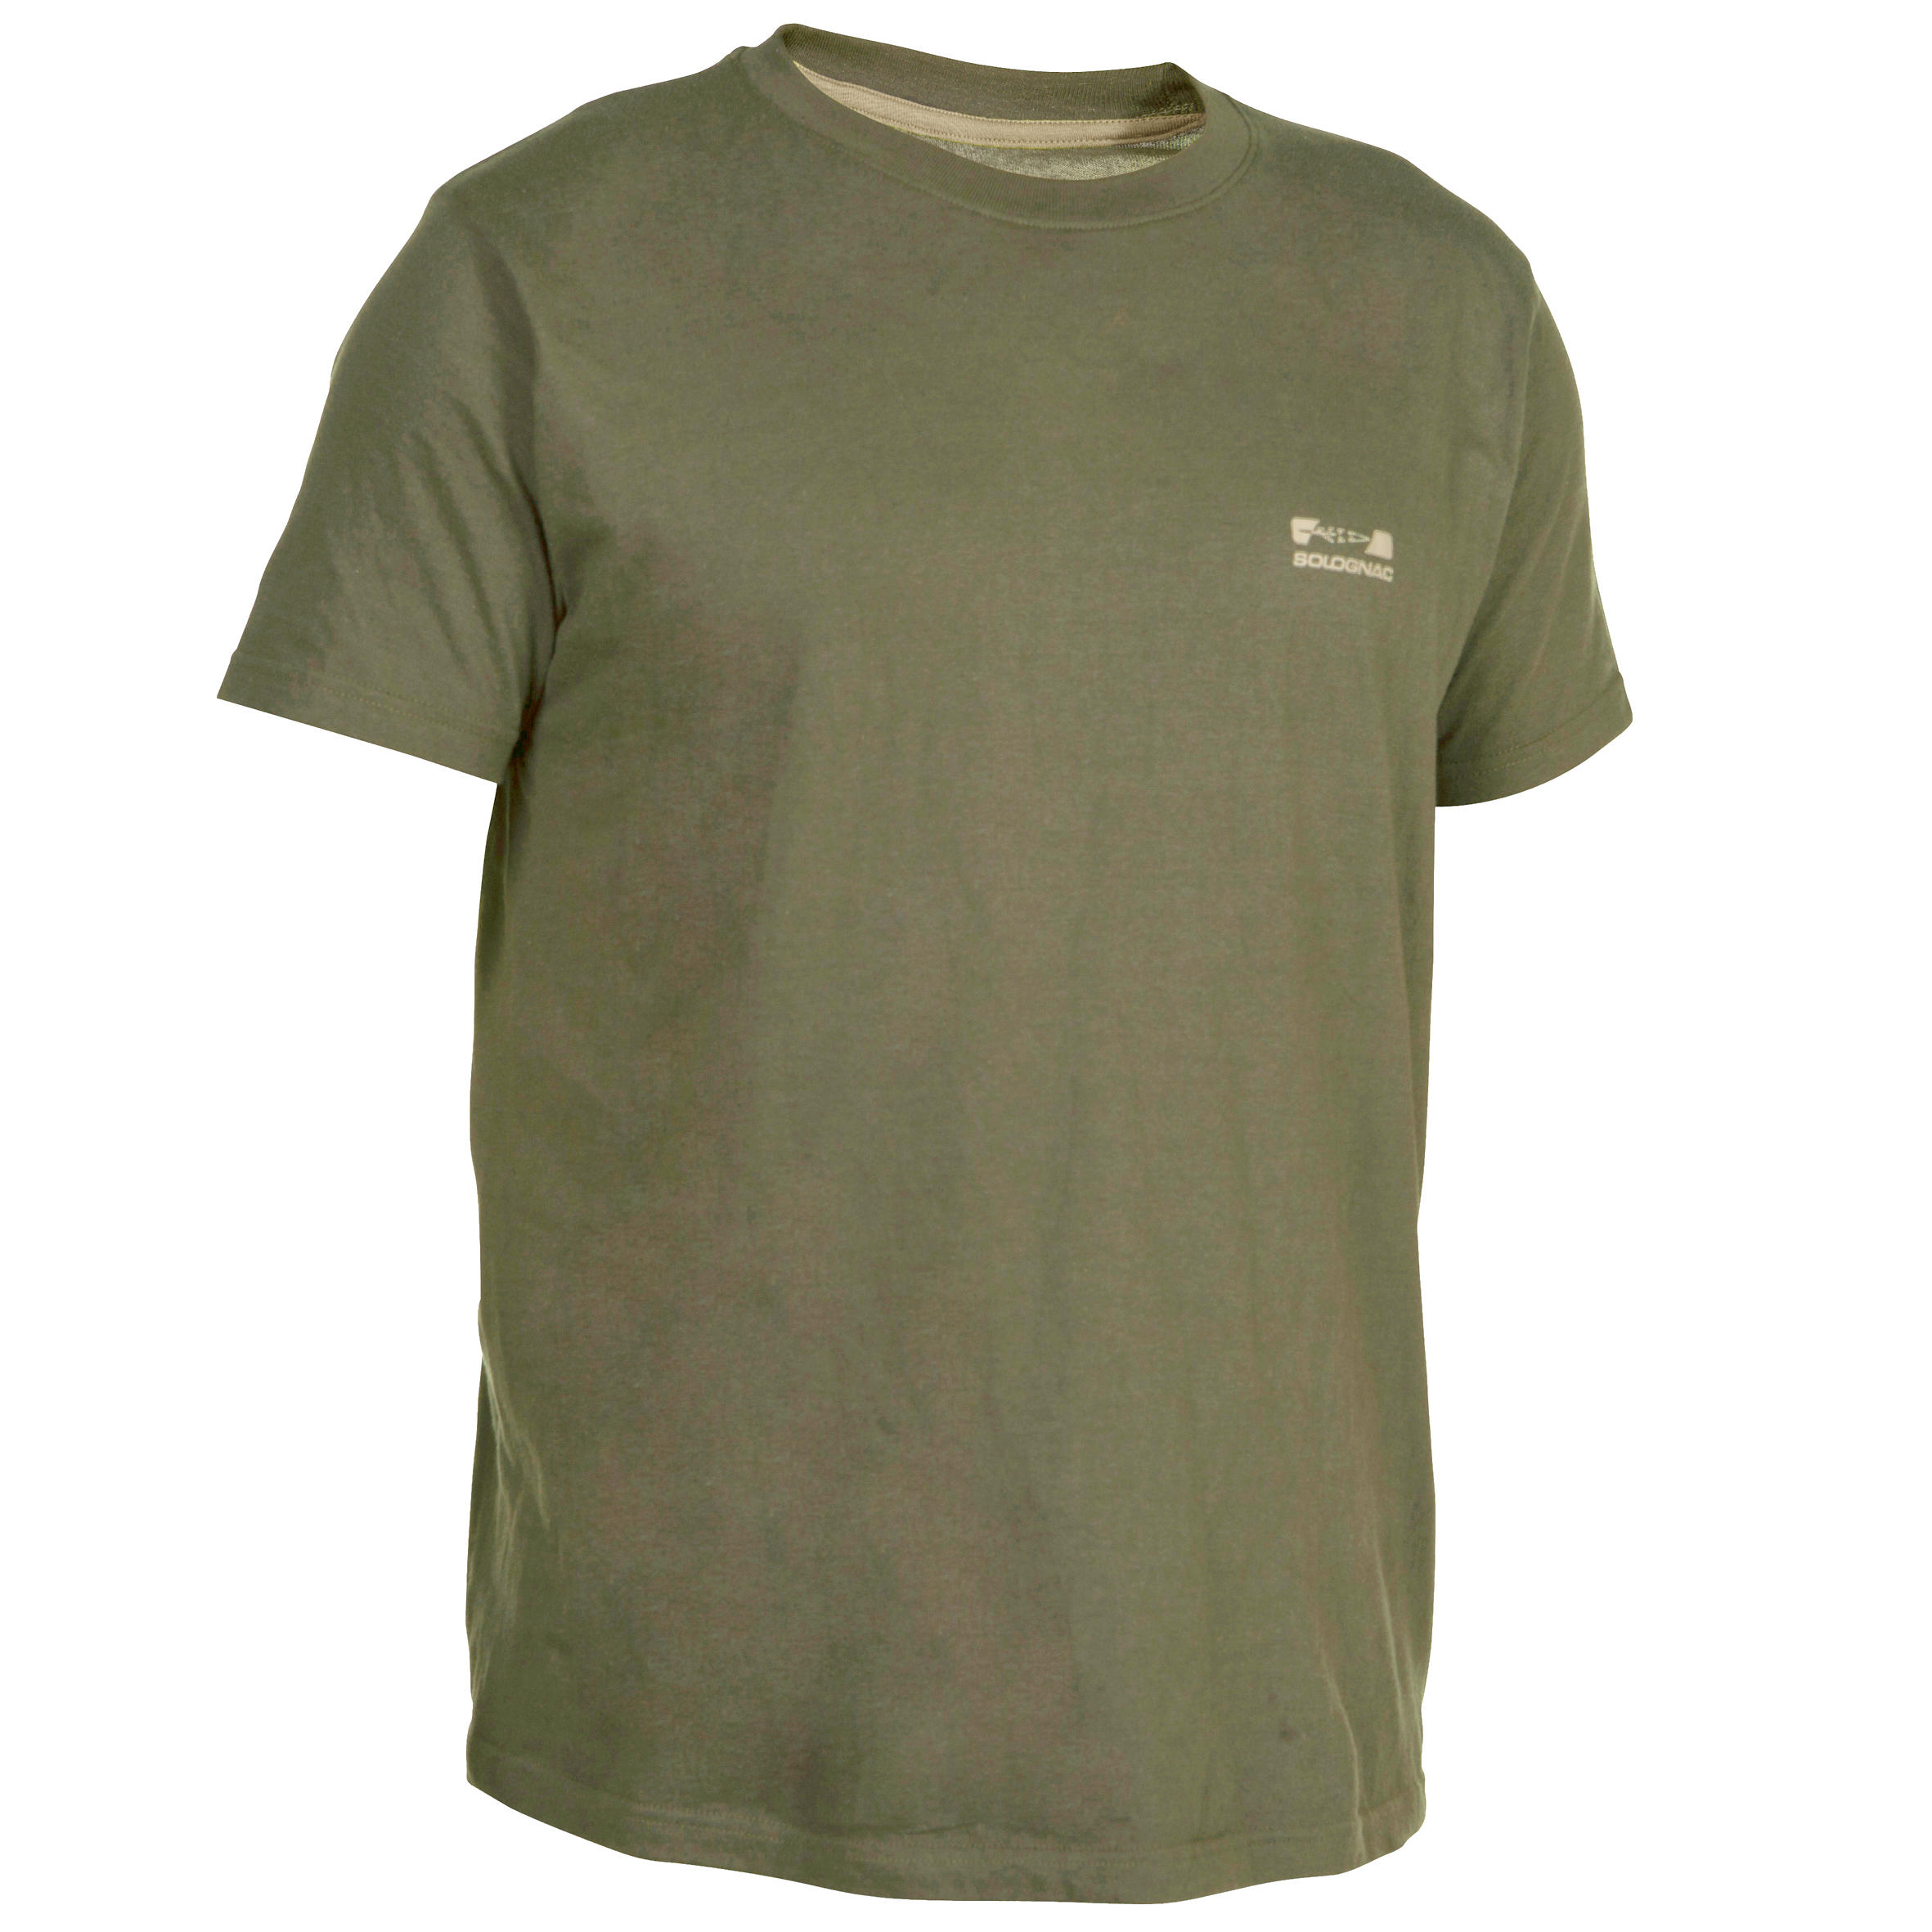 Solognac T-shirt Steppe 100 met korte mouwen